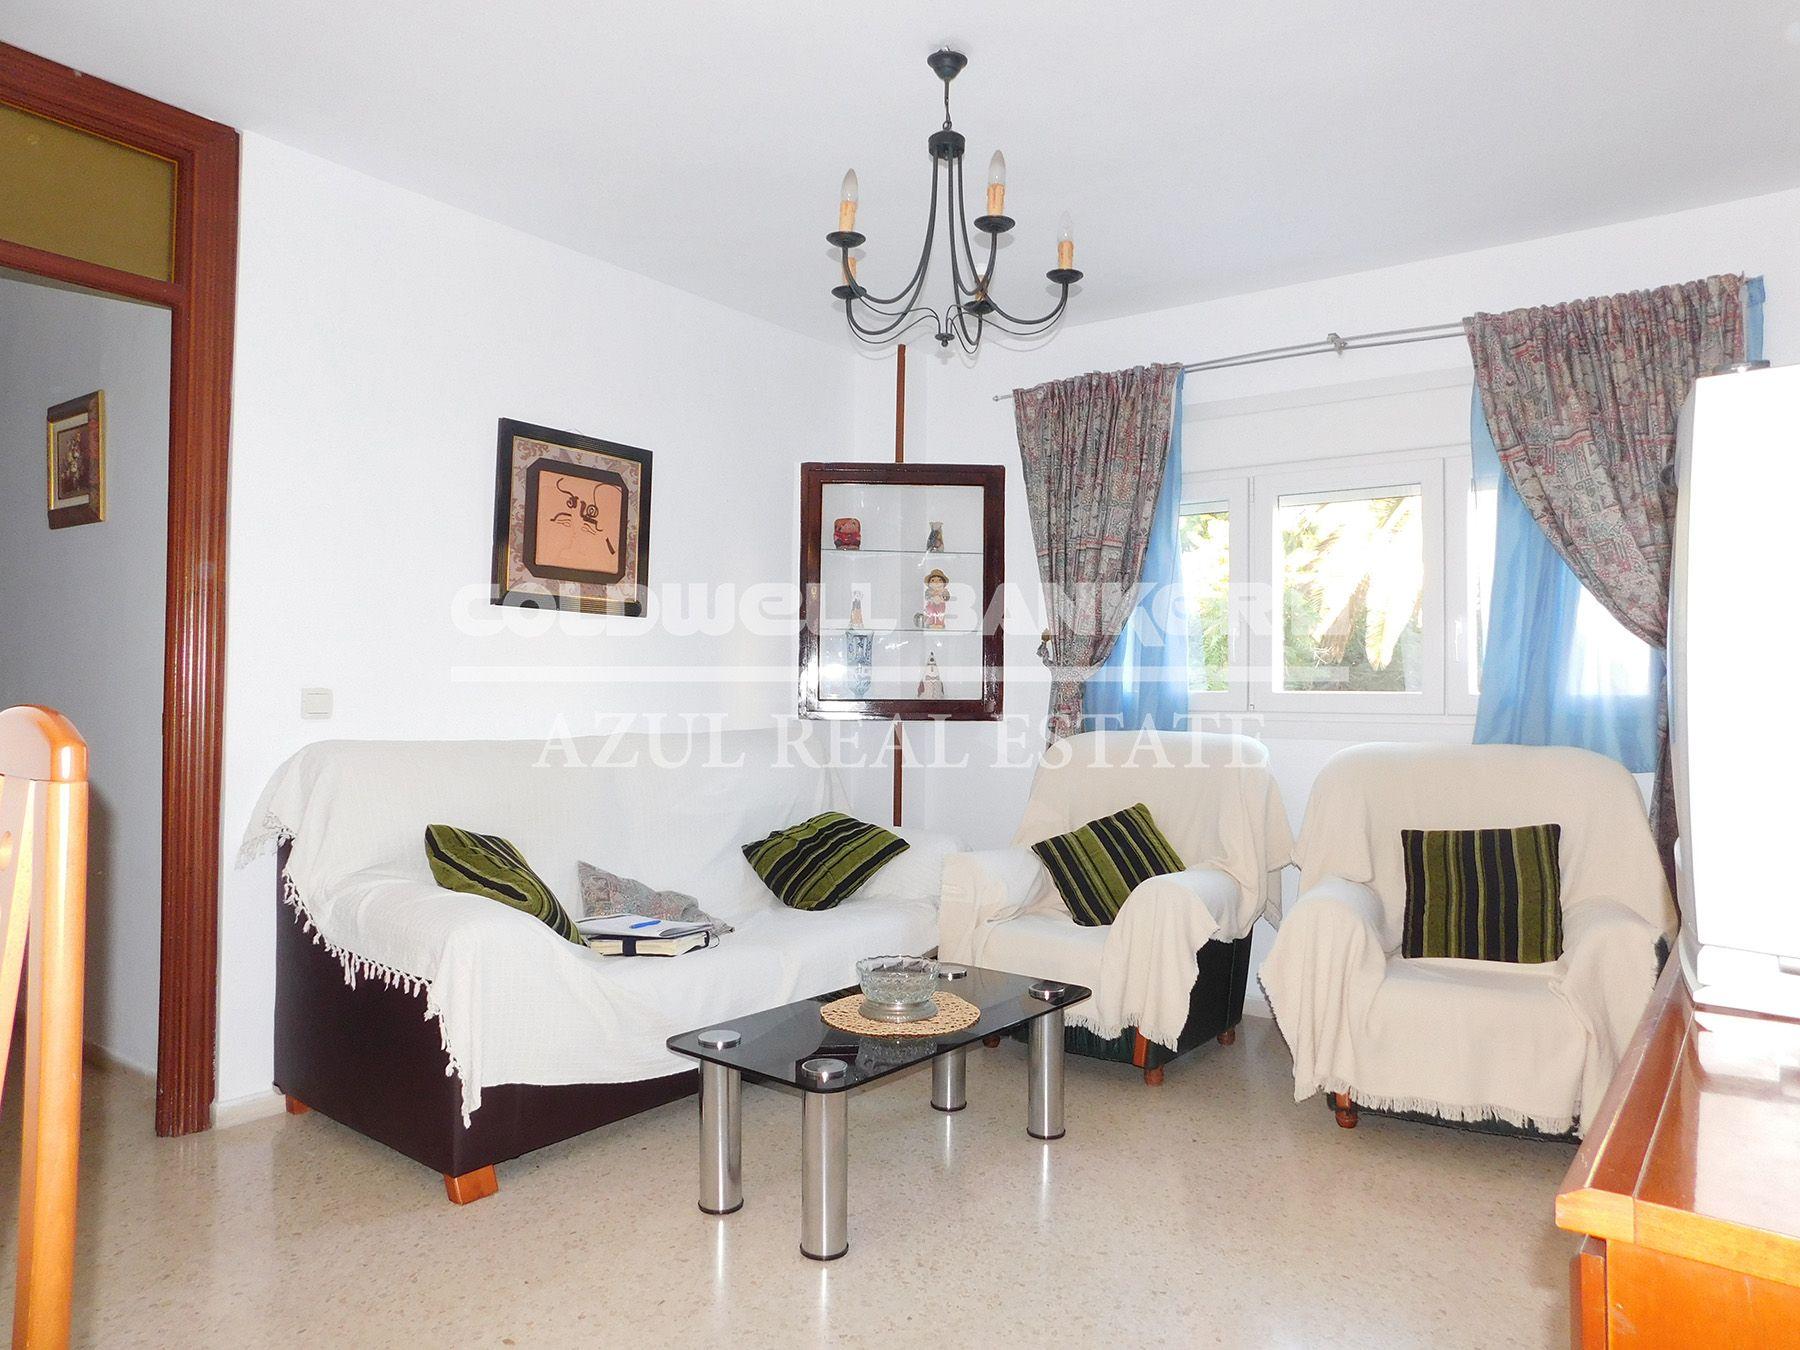 Apartamento en Málaga, CORTE INGLES, alquiler